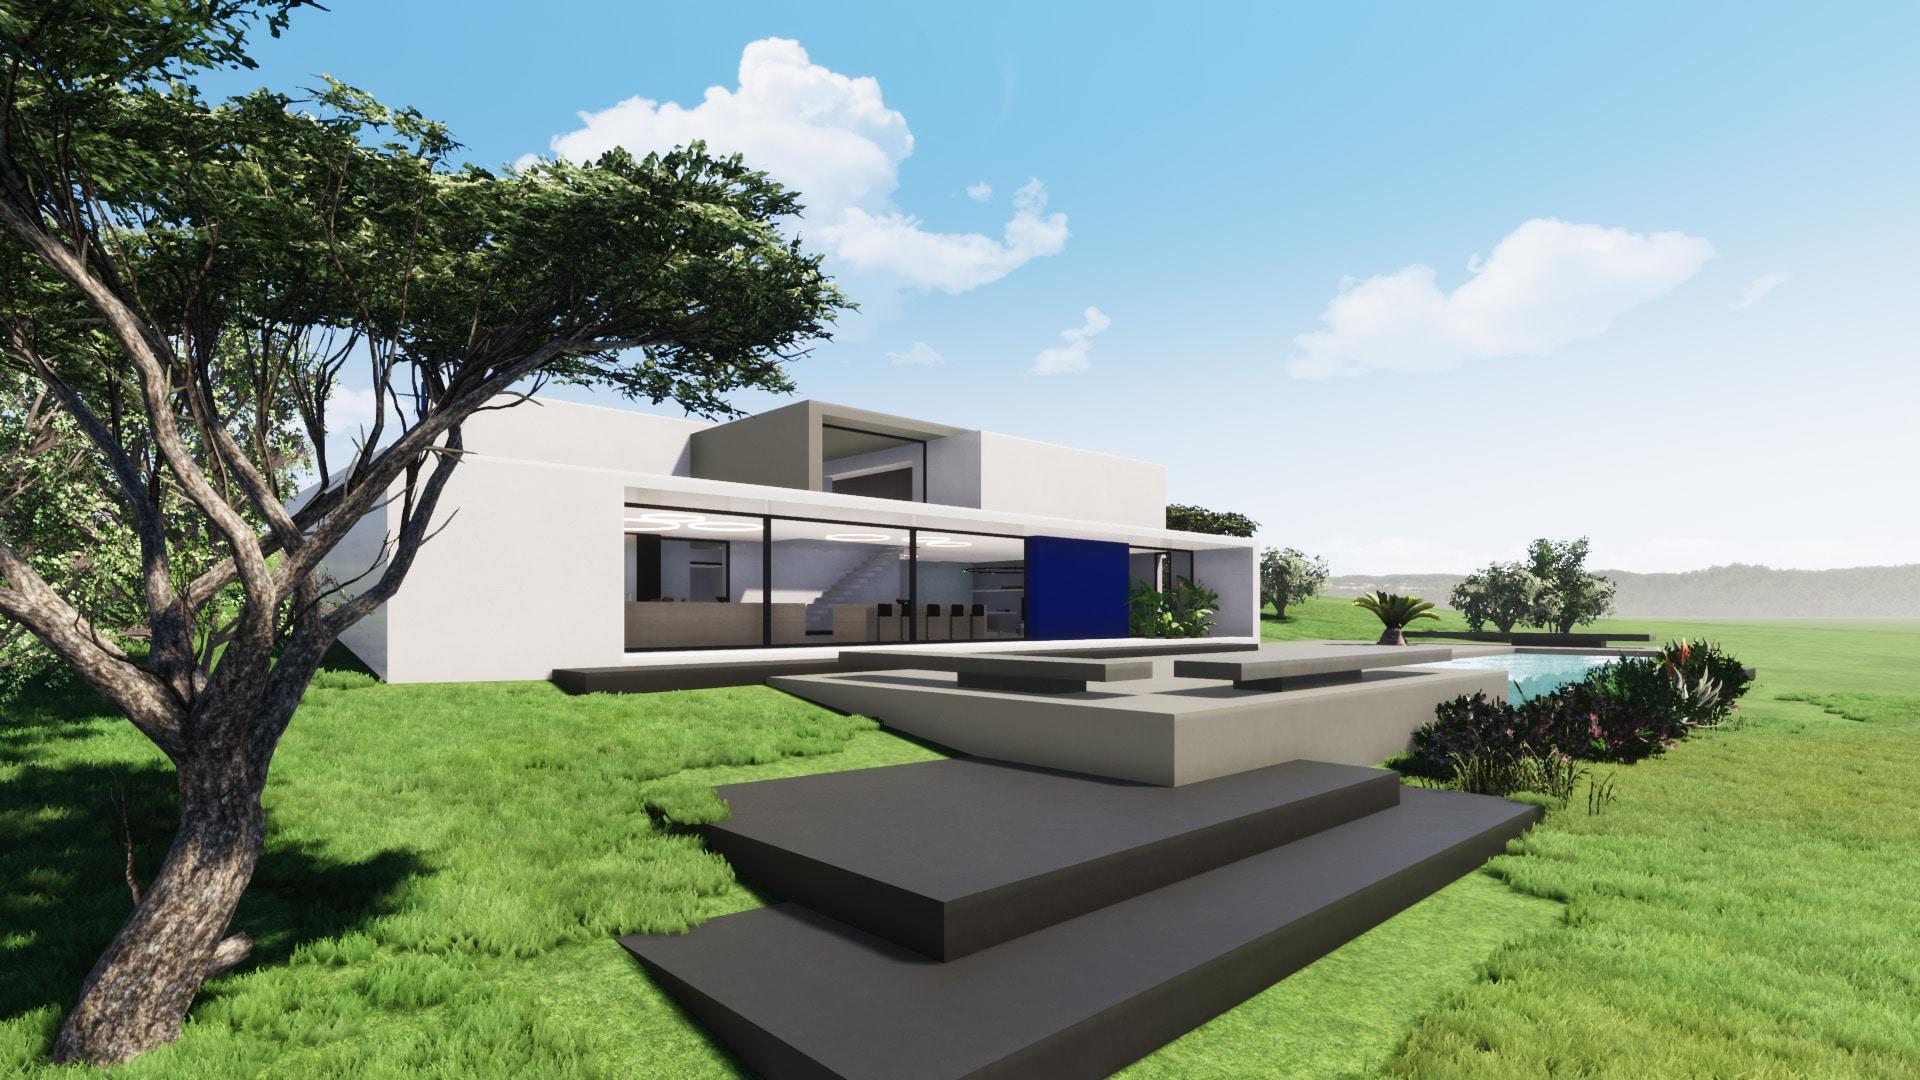 Villa-Saphir_Franck-Vadot-Architecture_01